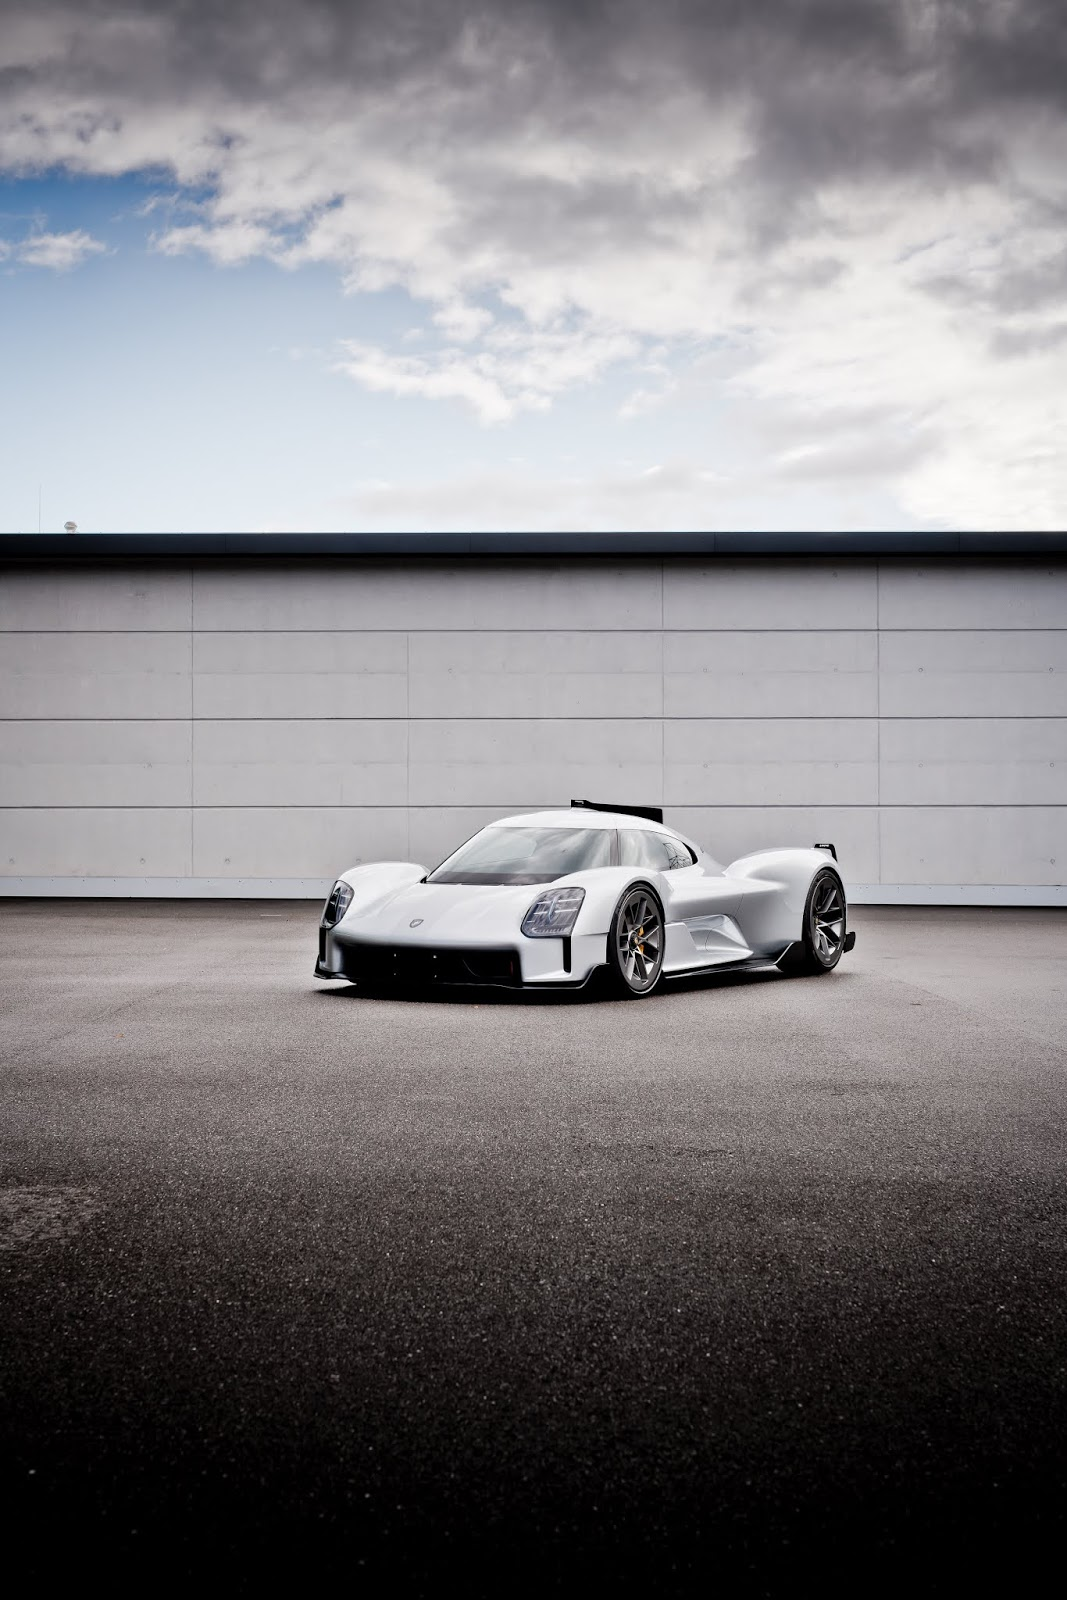 BU16899 Τα άγνωστα Hypercars της Porsche hypercar, Porsche, Porsche Unseen, Sunday, supercar, supercars, zblog, ειδήσεις